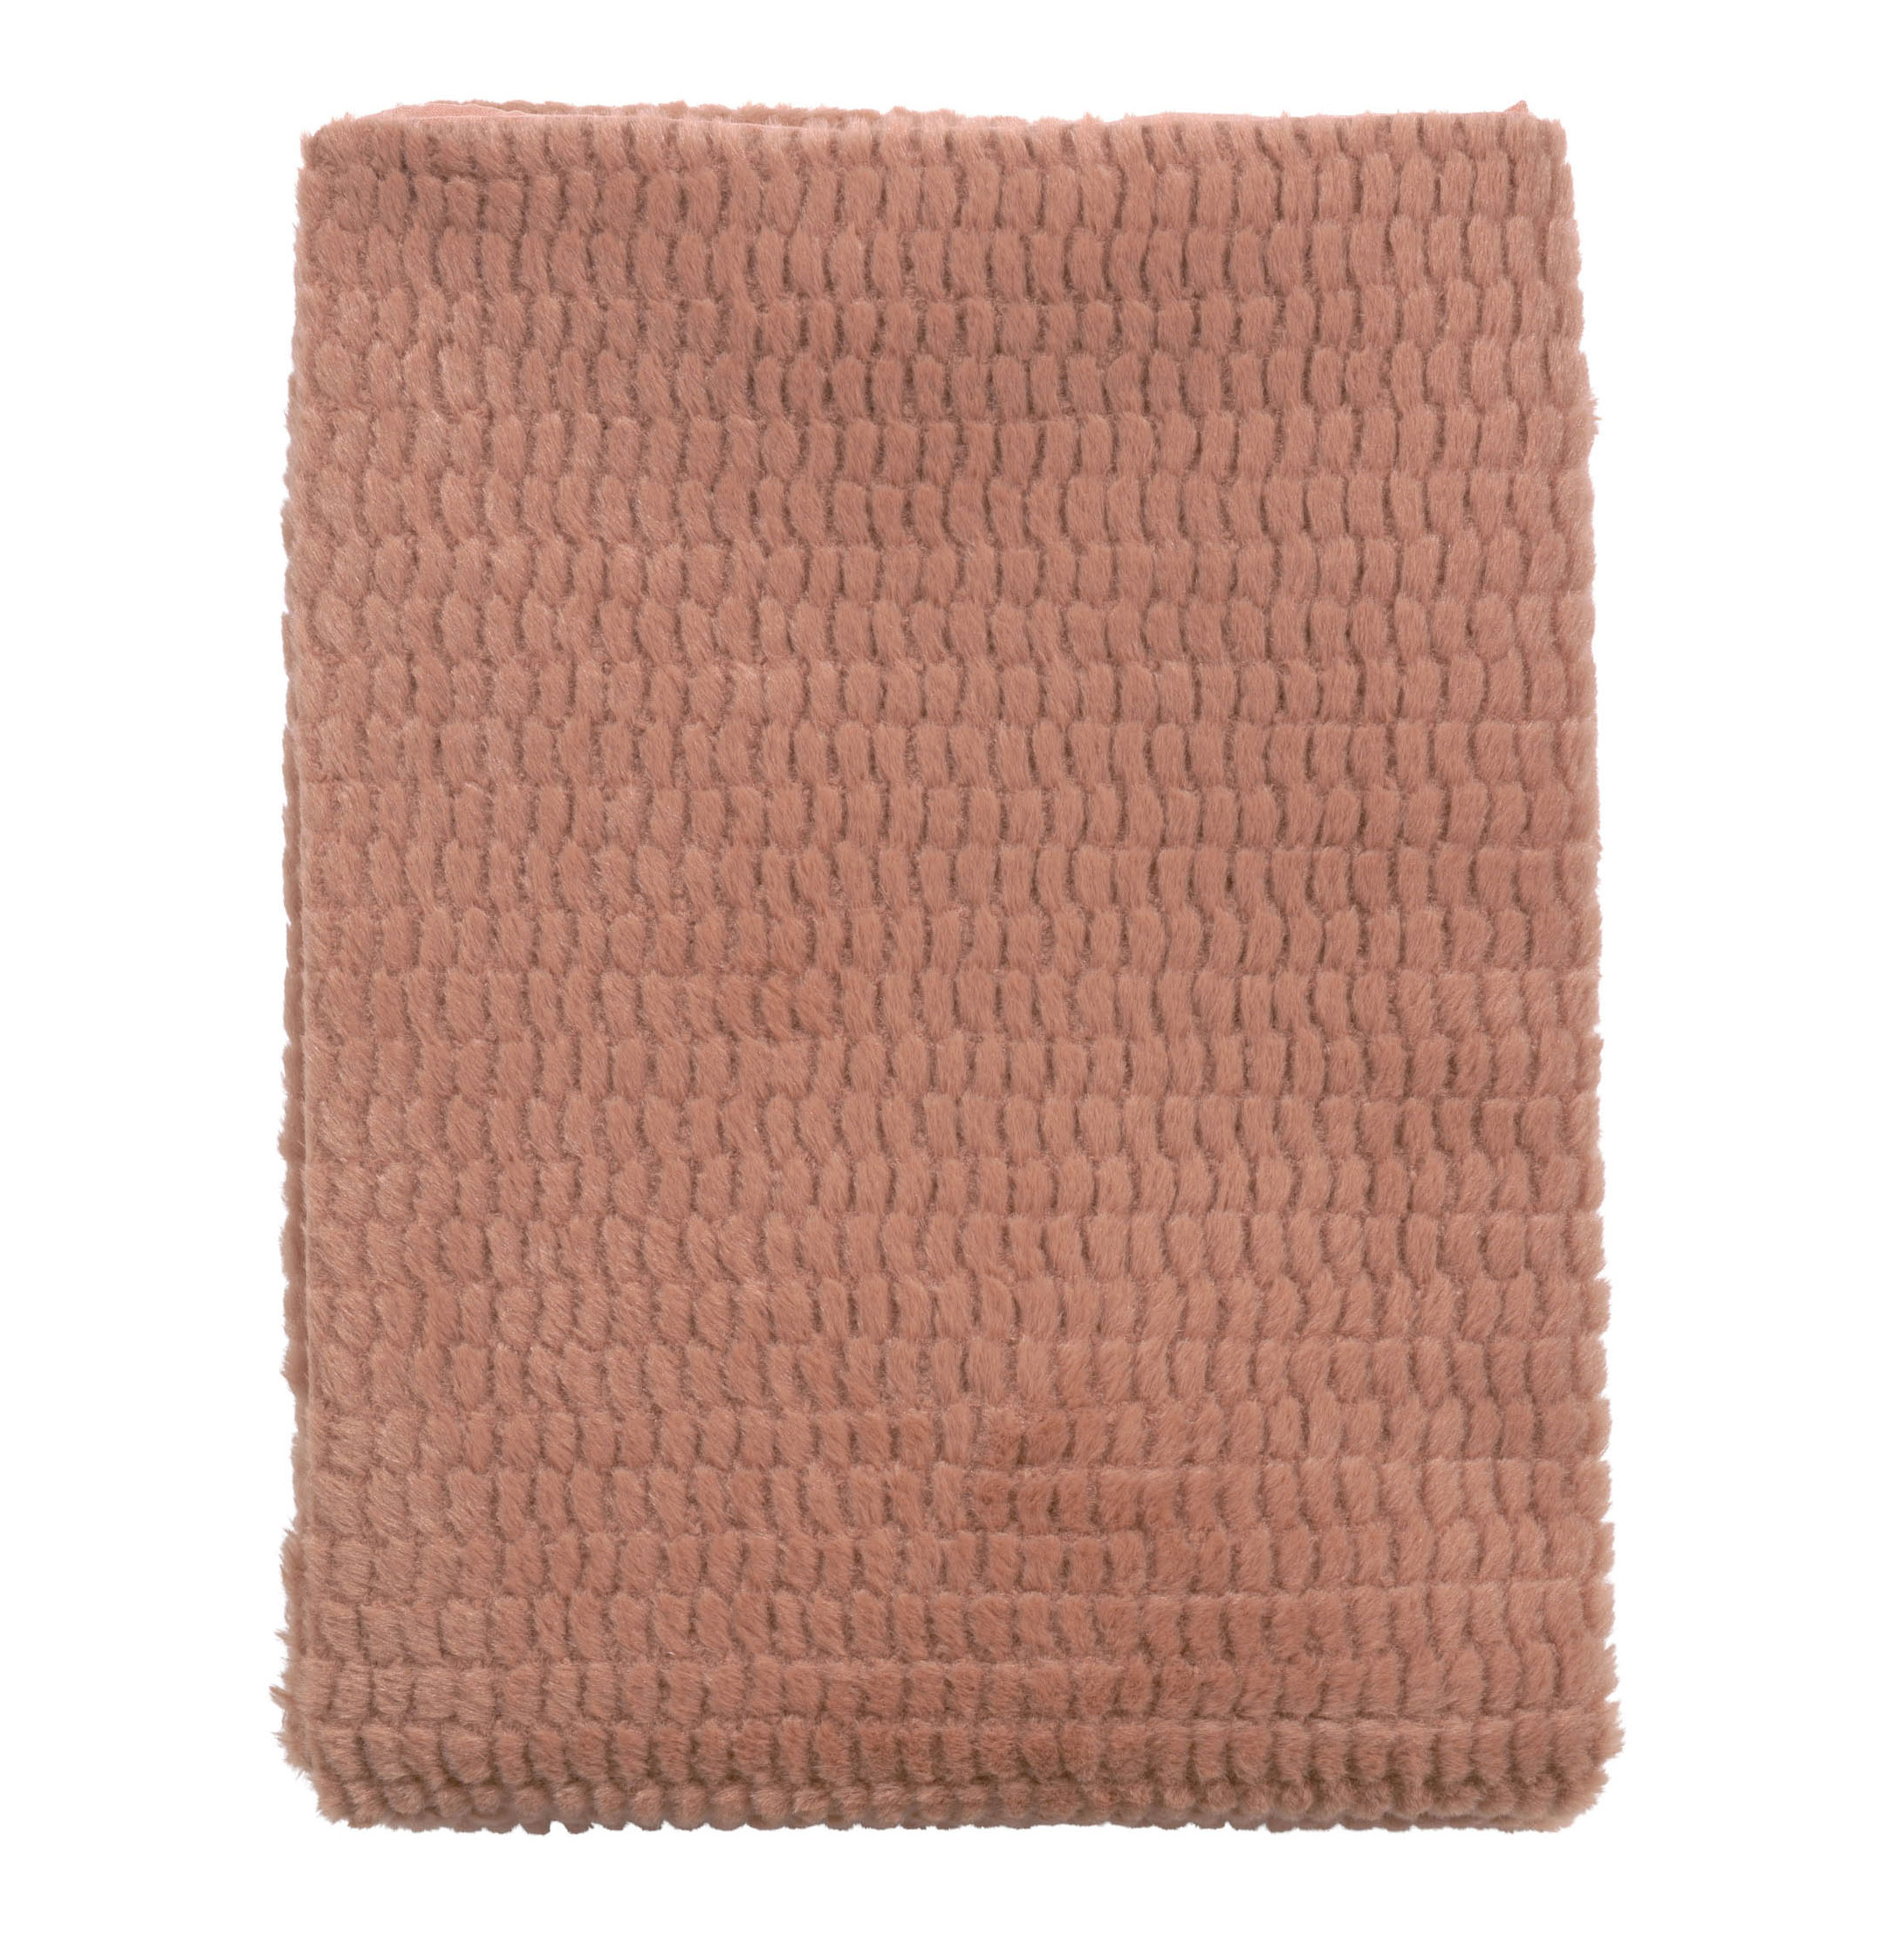 TIMY - Plaid koper 130x180 cm